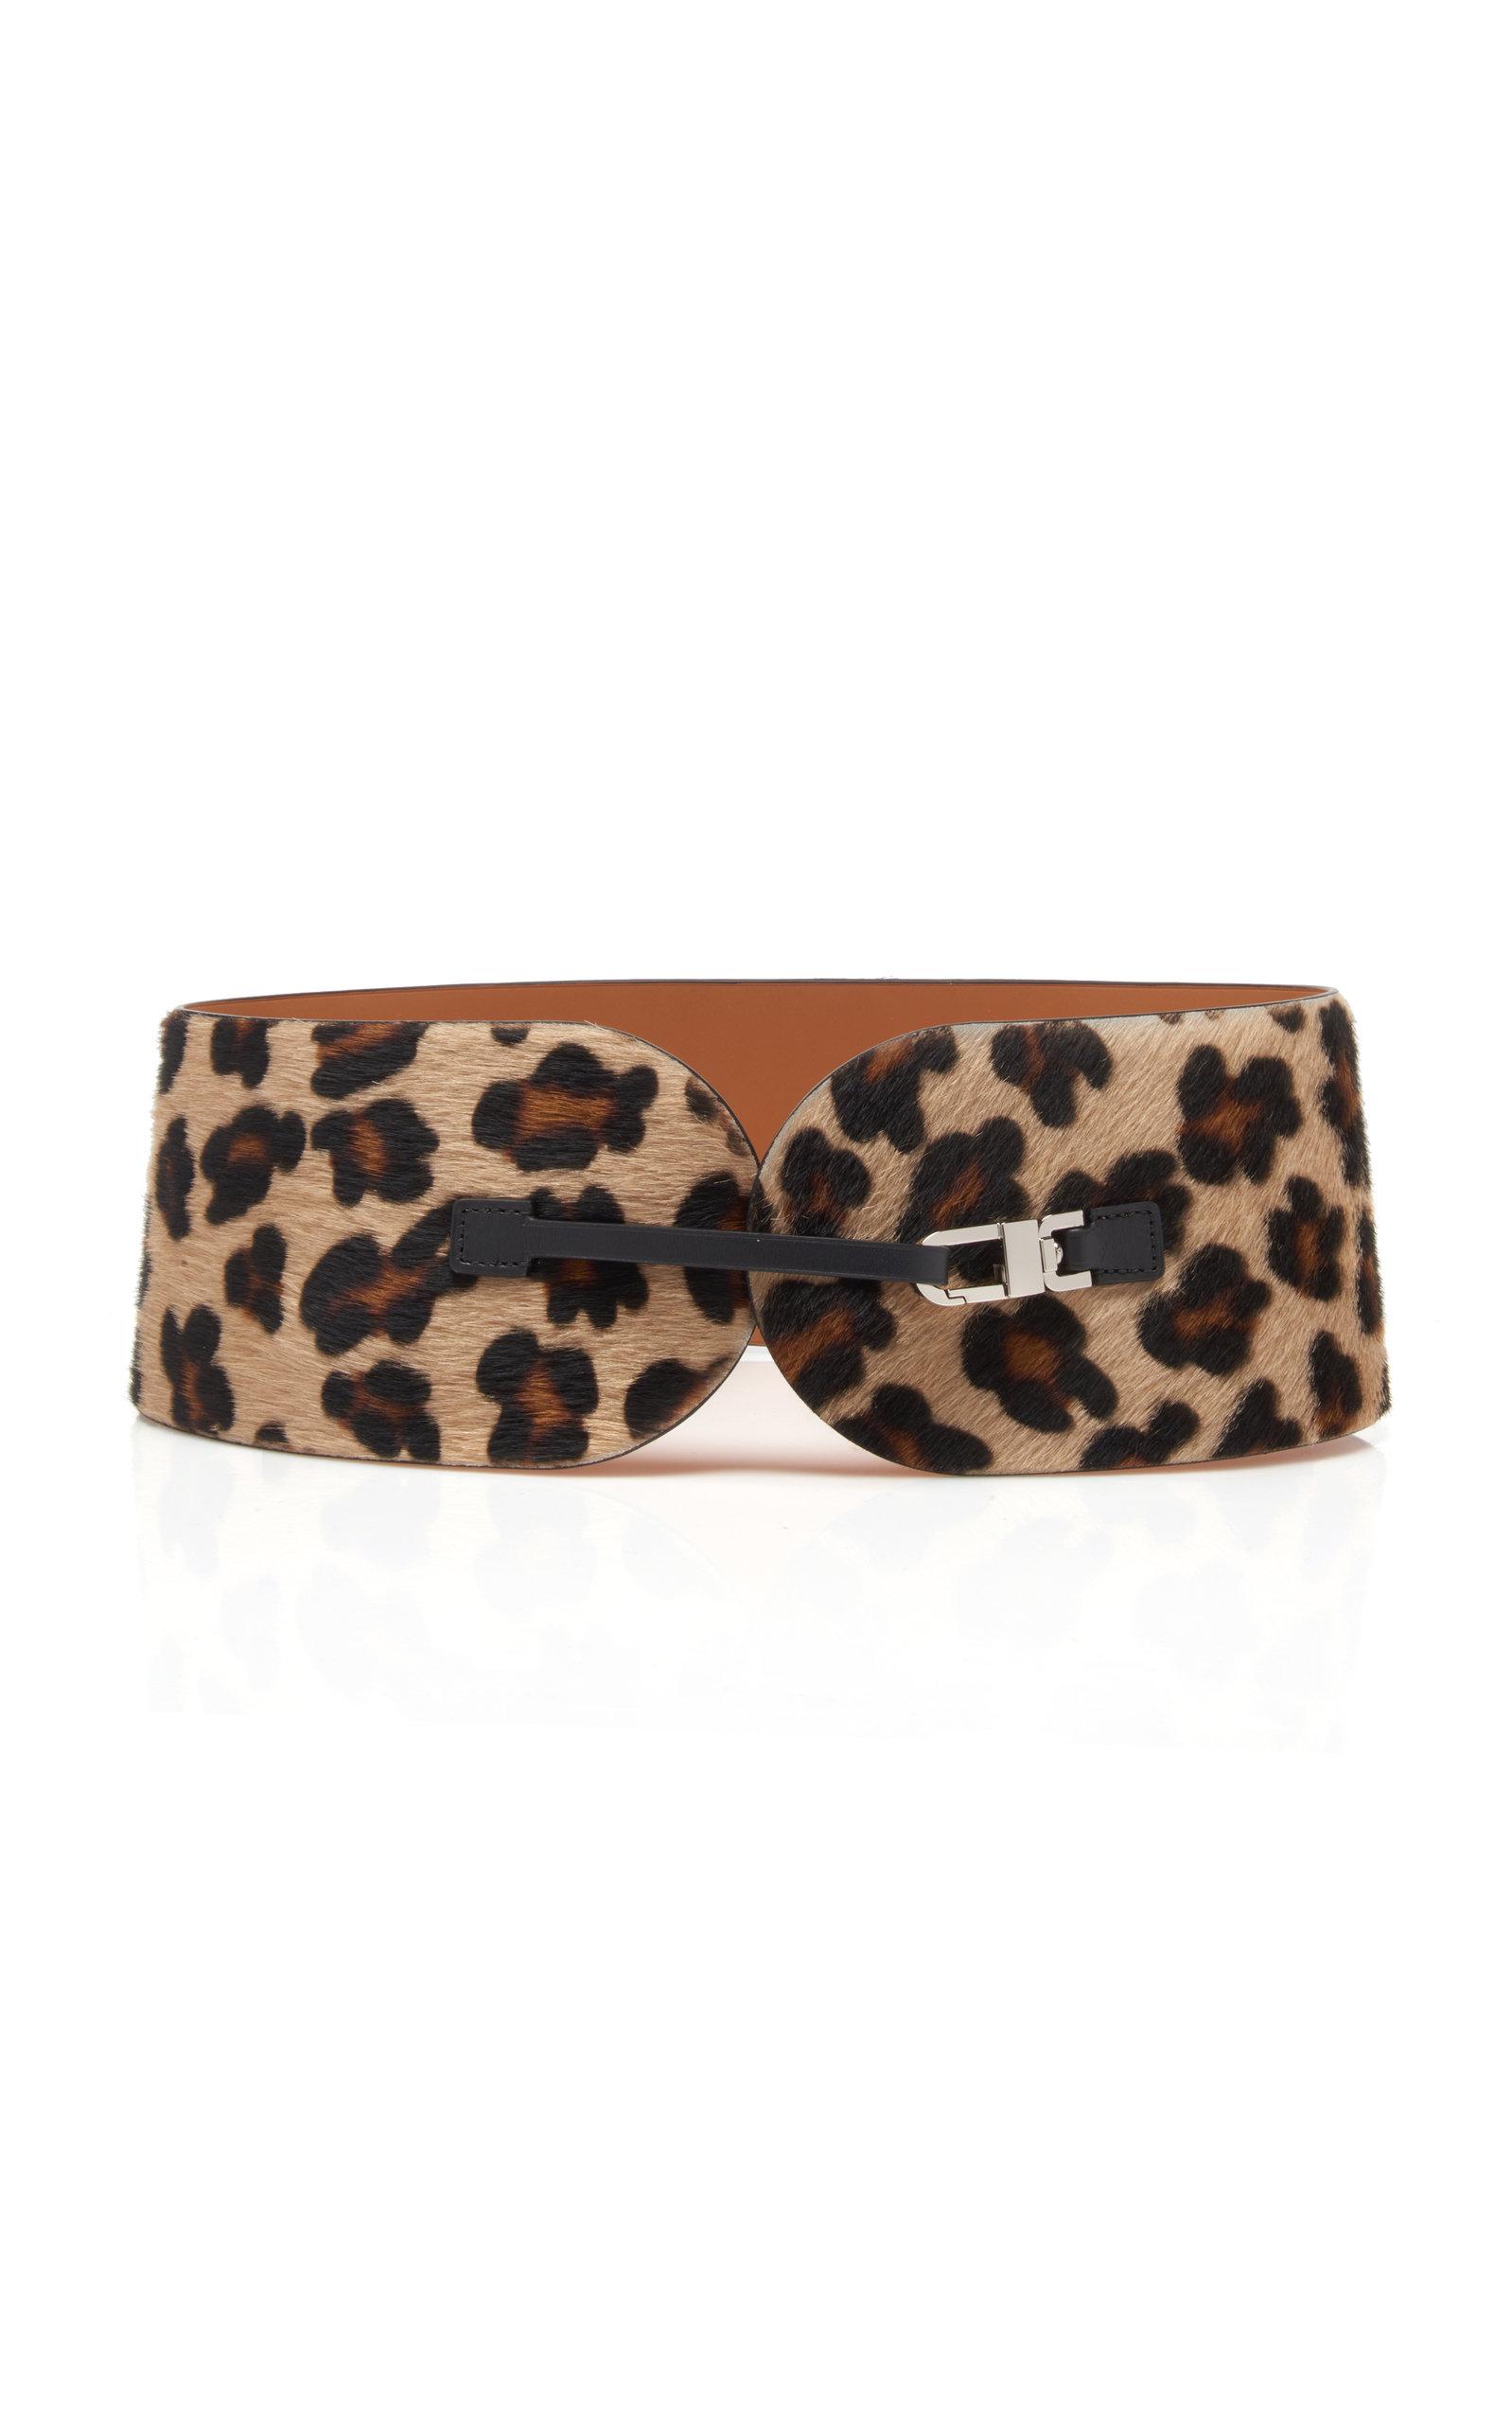 M'O Exclusive Leopard Print Calf-Hair Belt in Animal